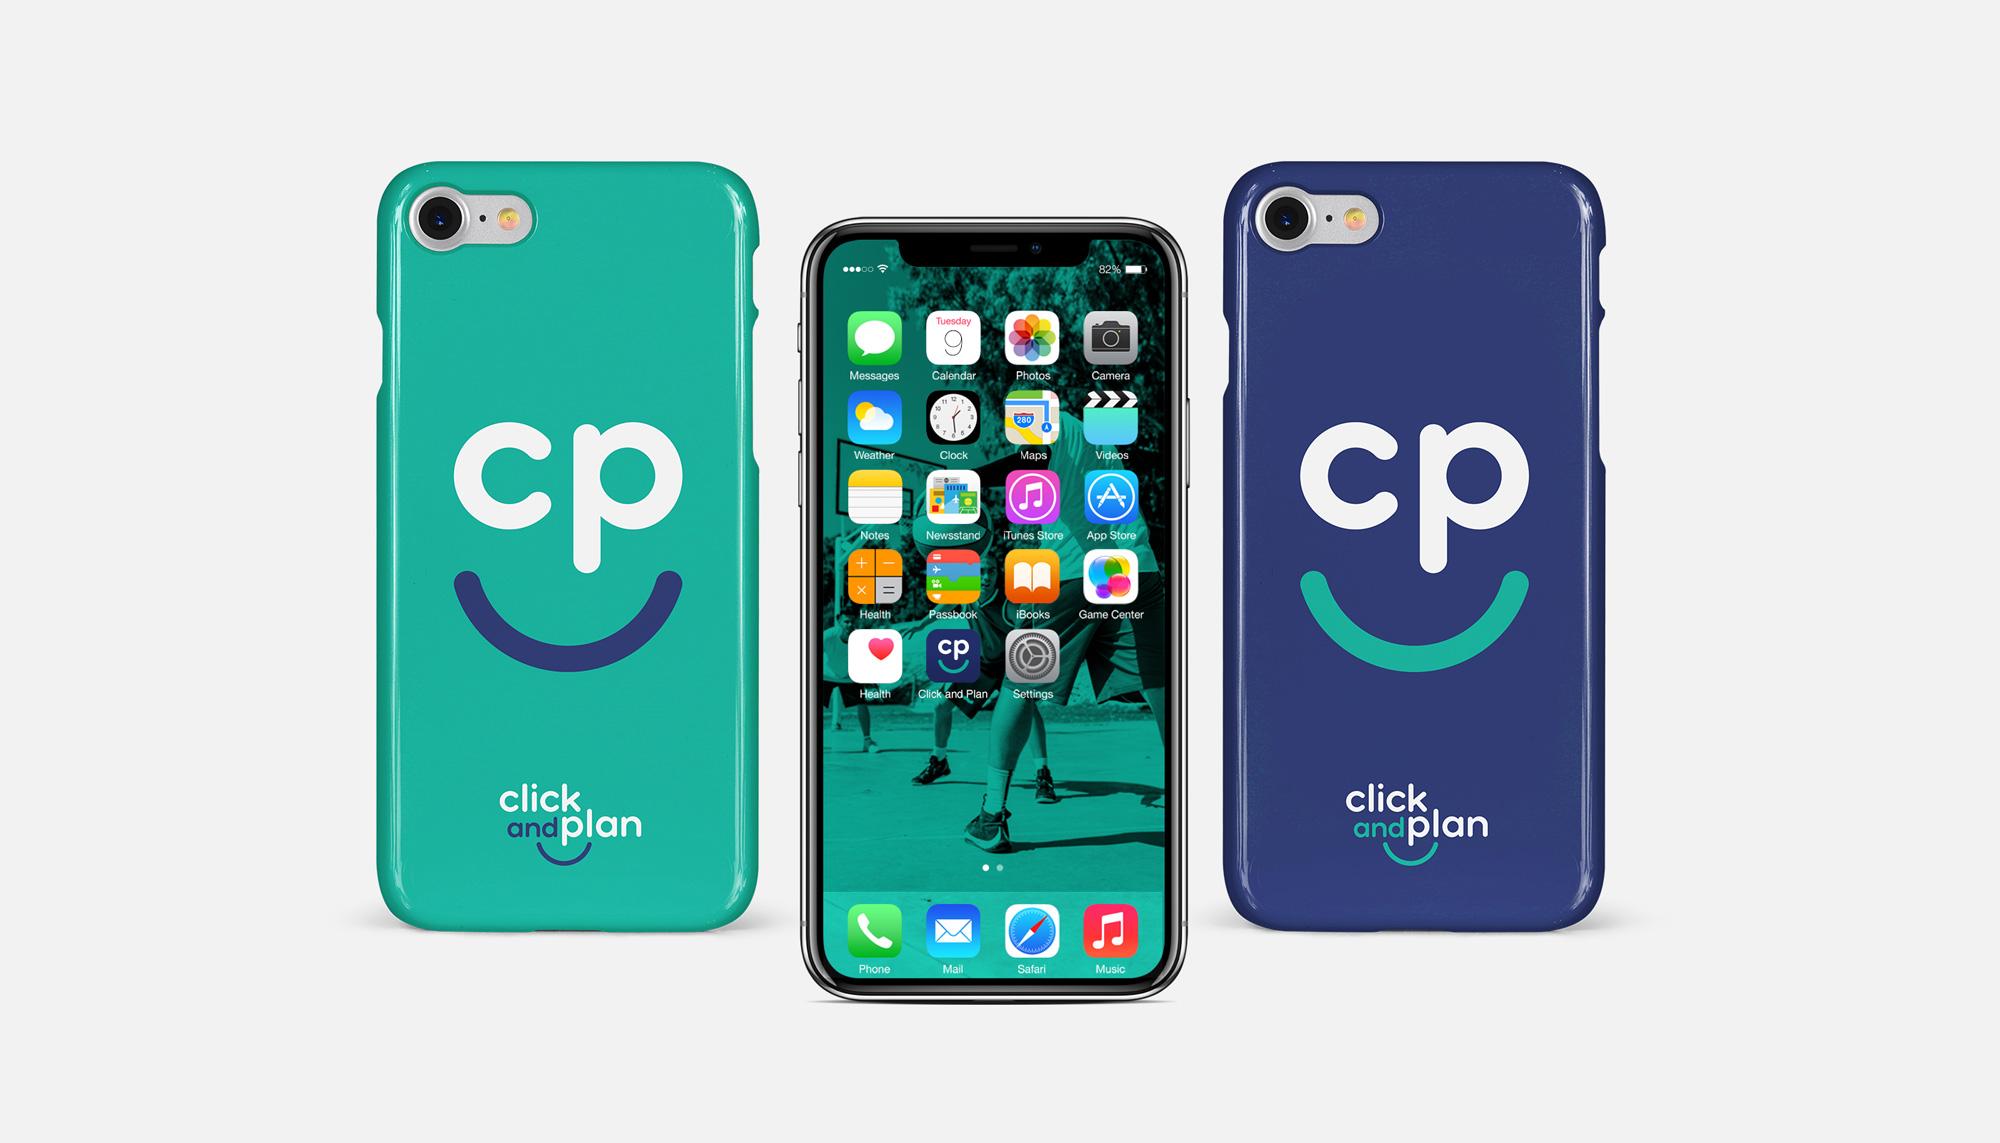 Merchandising App Click and Plan